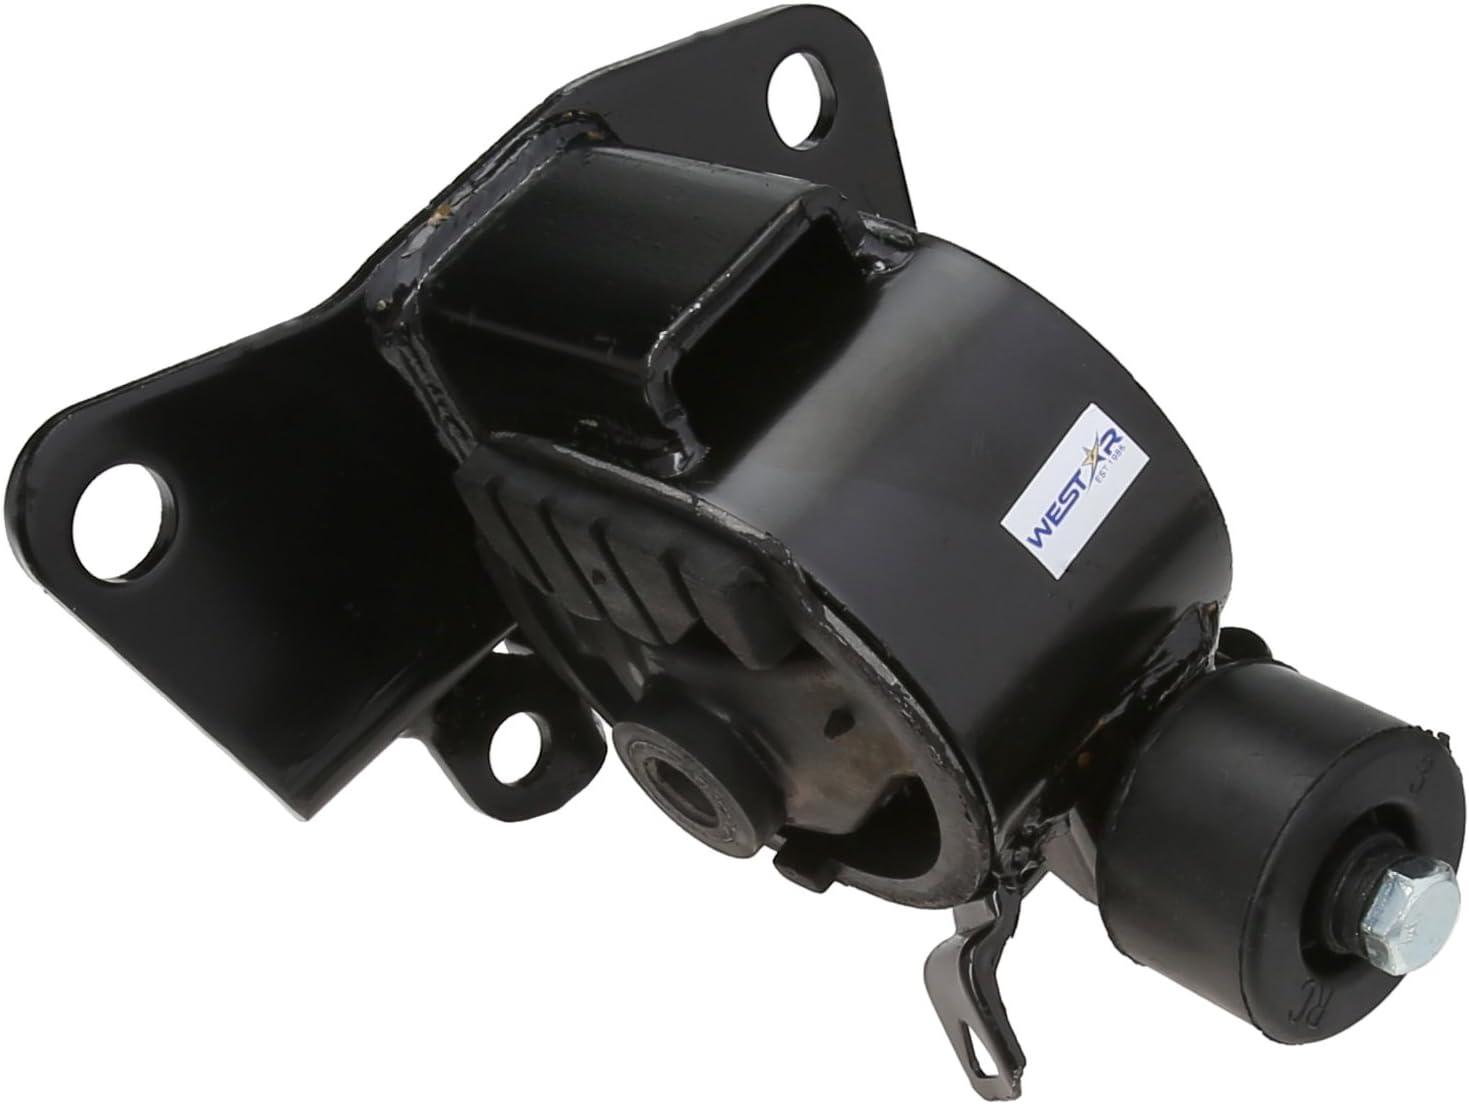 Pontiac Vibe Corolla Toyota Matrix 1.8L Fluid/_Ounces Eagle BHP 1655 Transmission Motor Mount